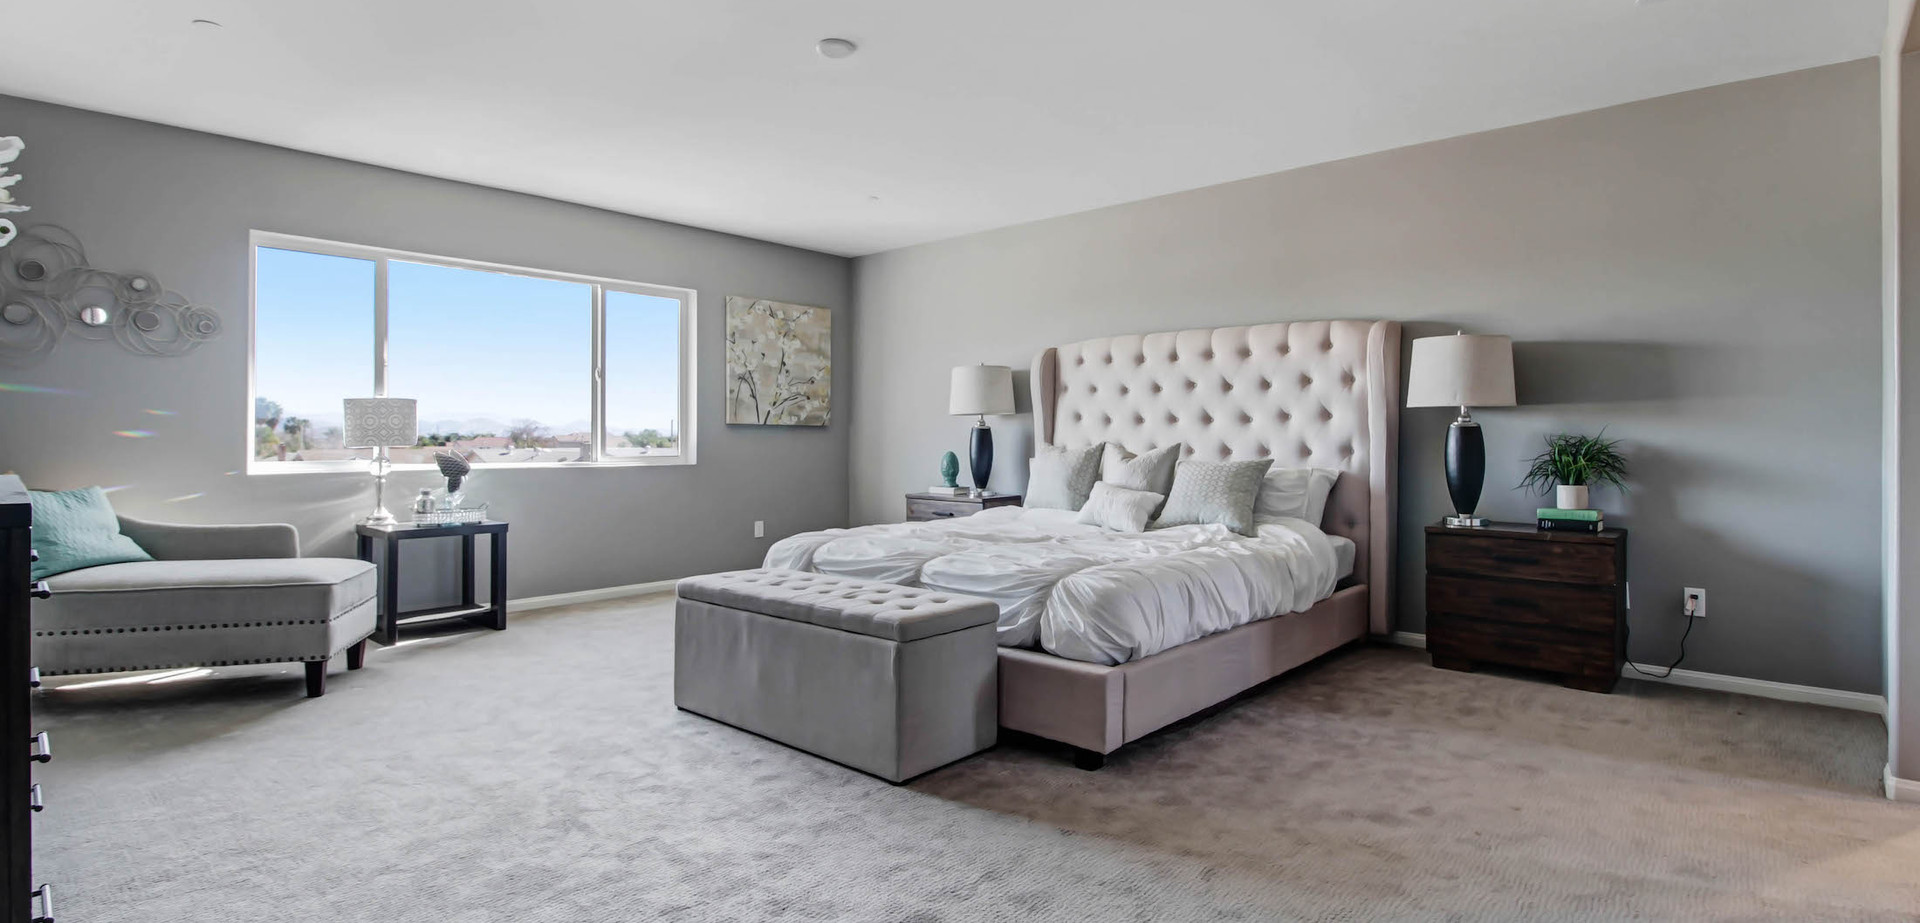 model-1 bedroom-1 2200x1500 (1).jpg